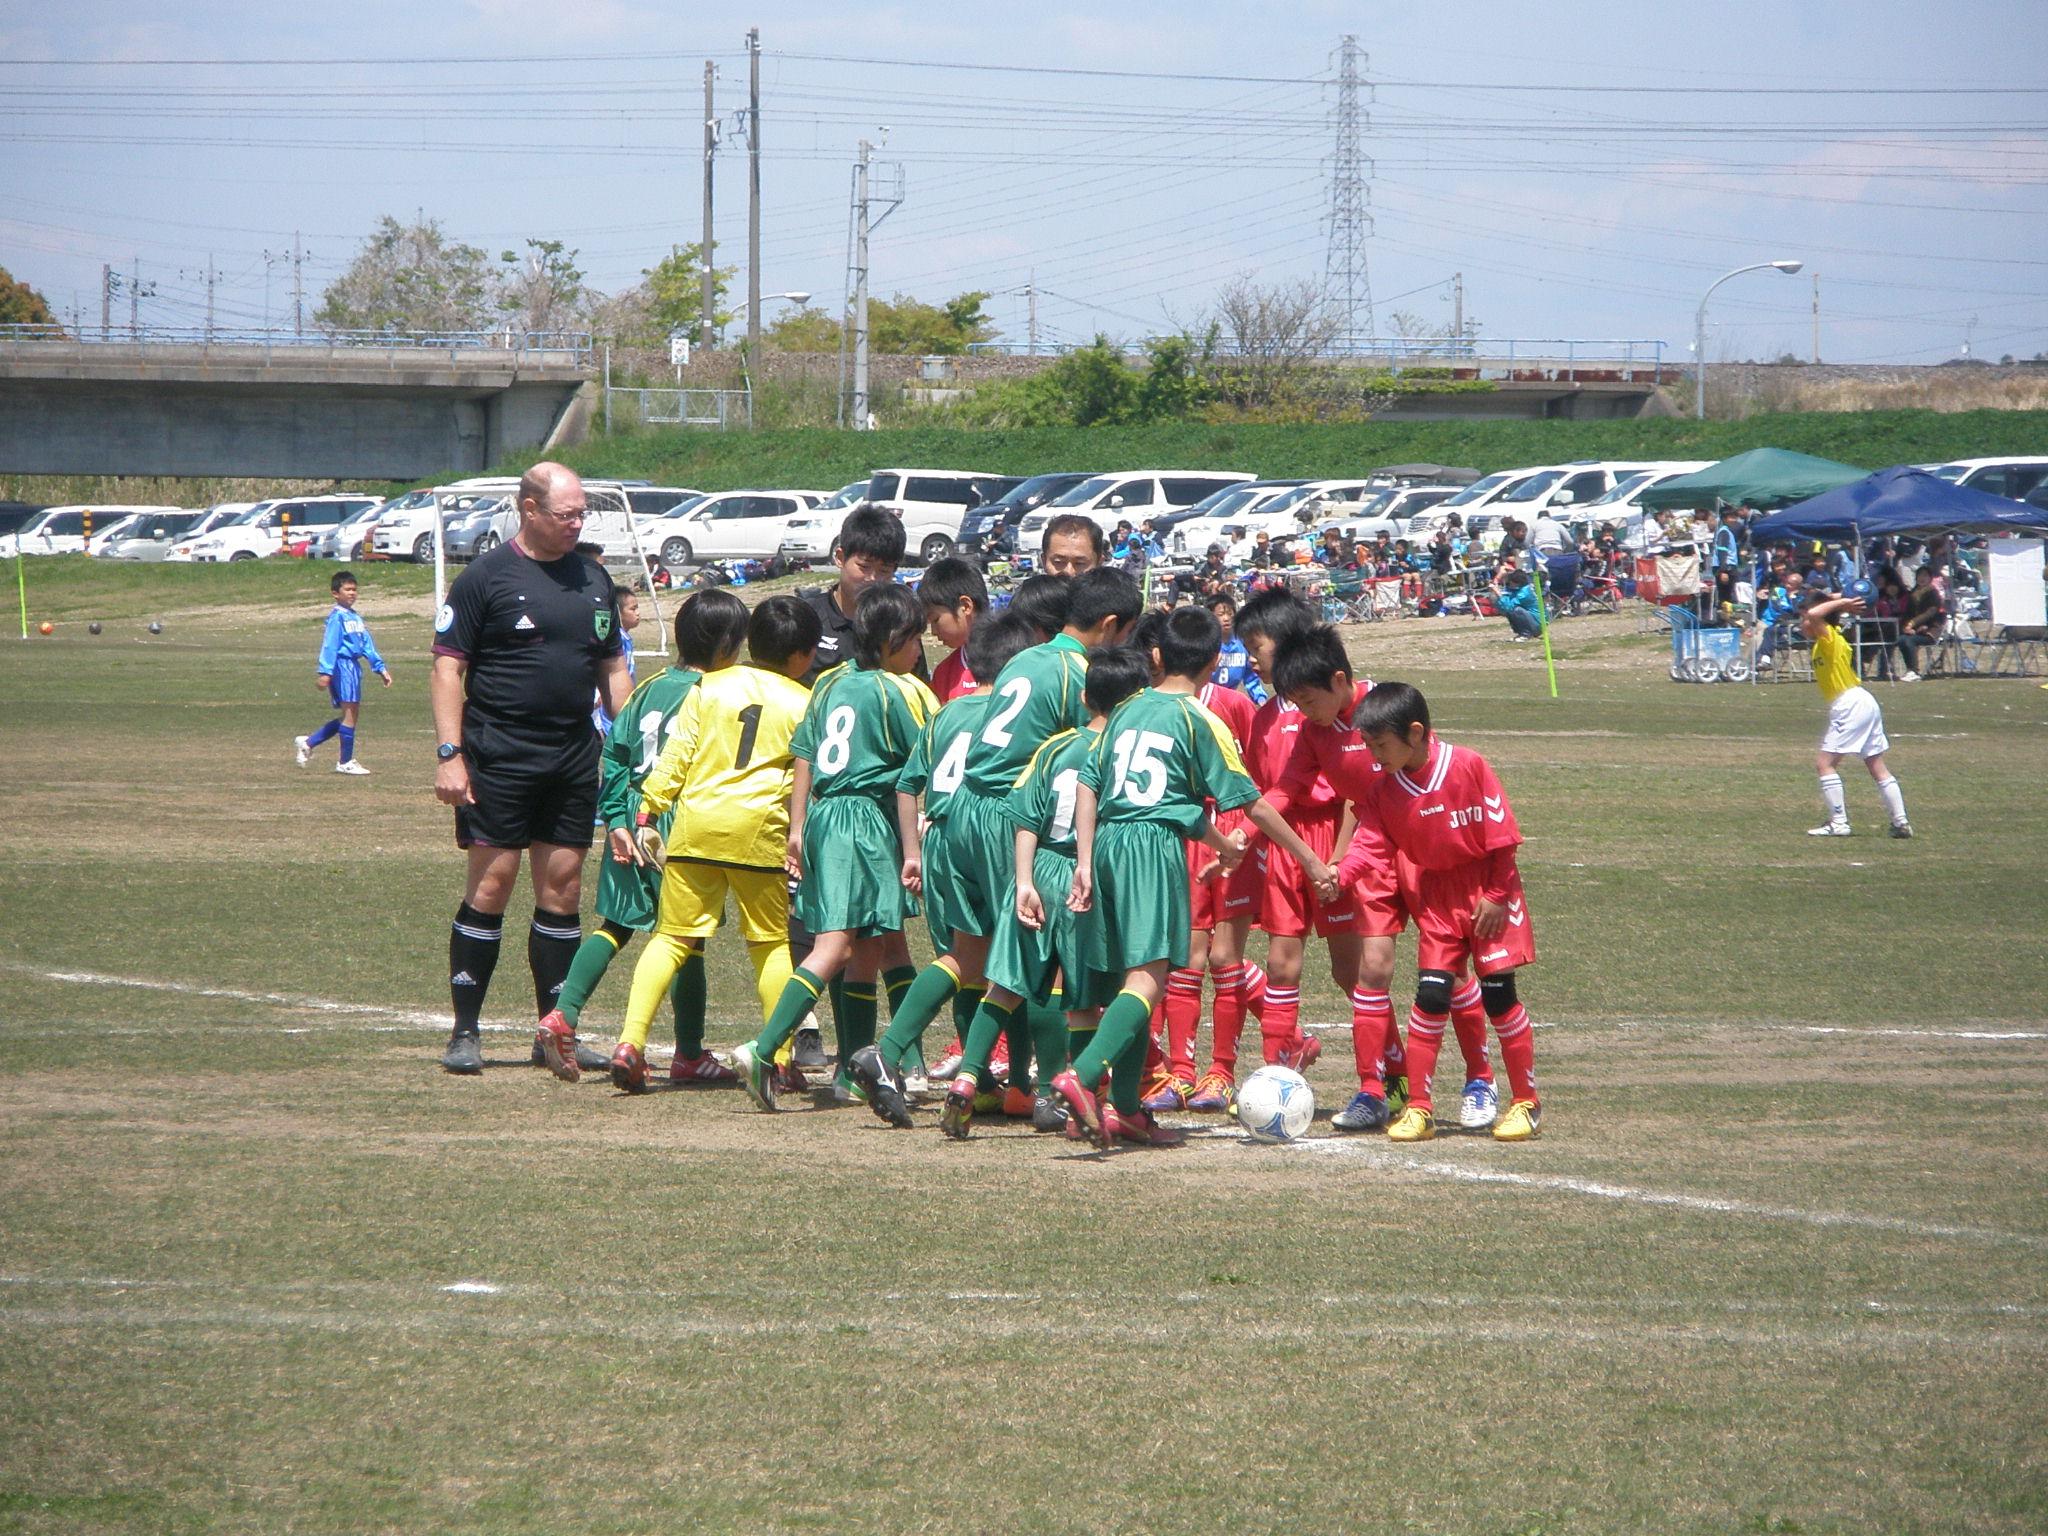 全日本少年サッカー大会中央地区1次リーグ対城東SSS戦